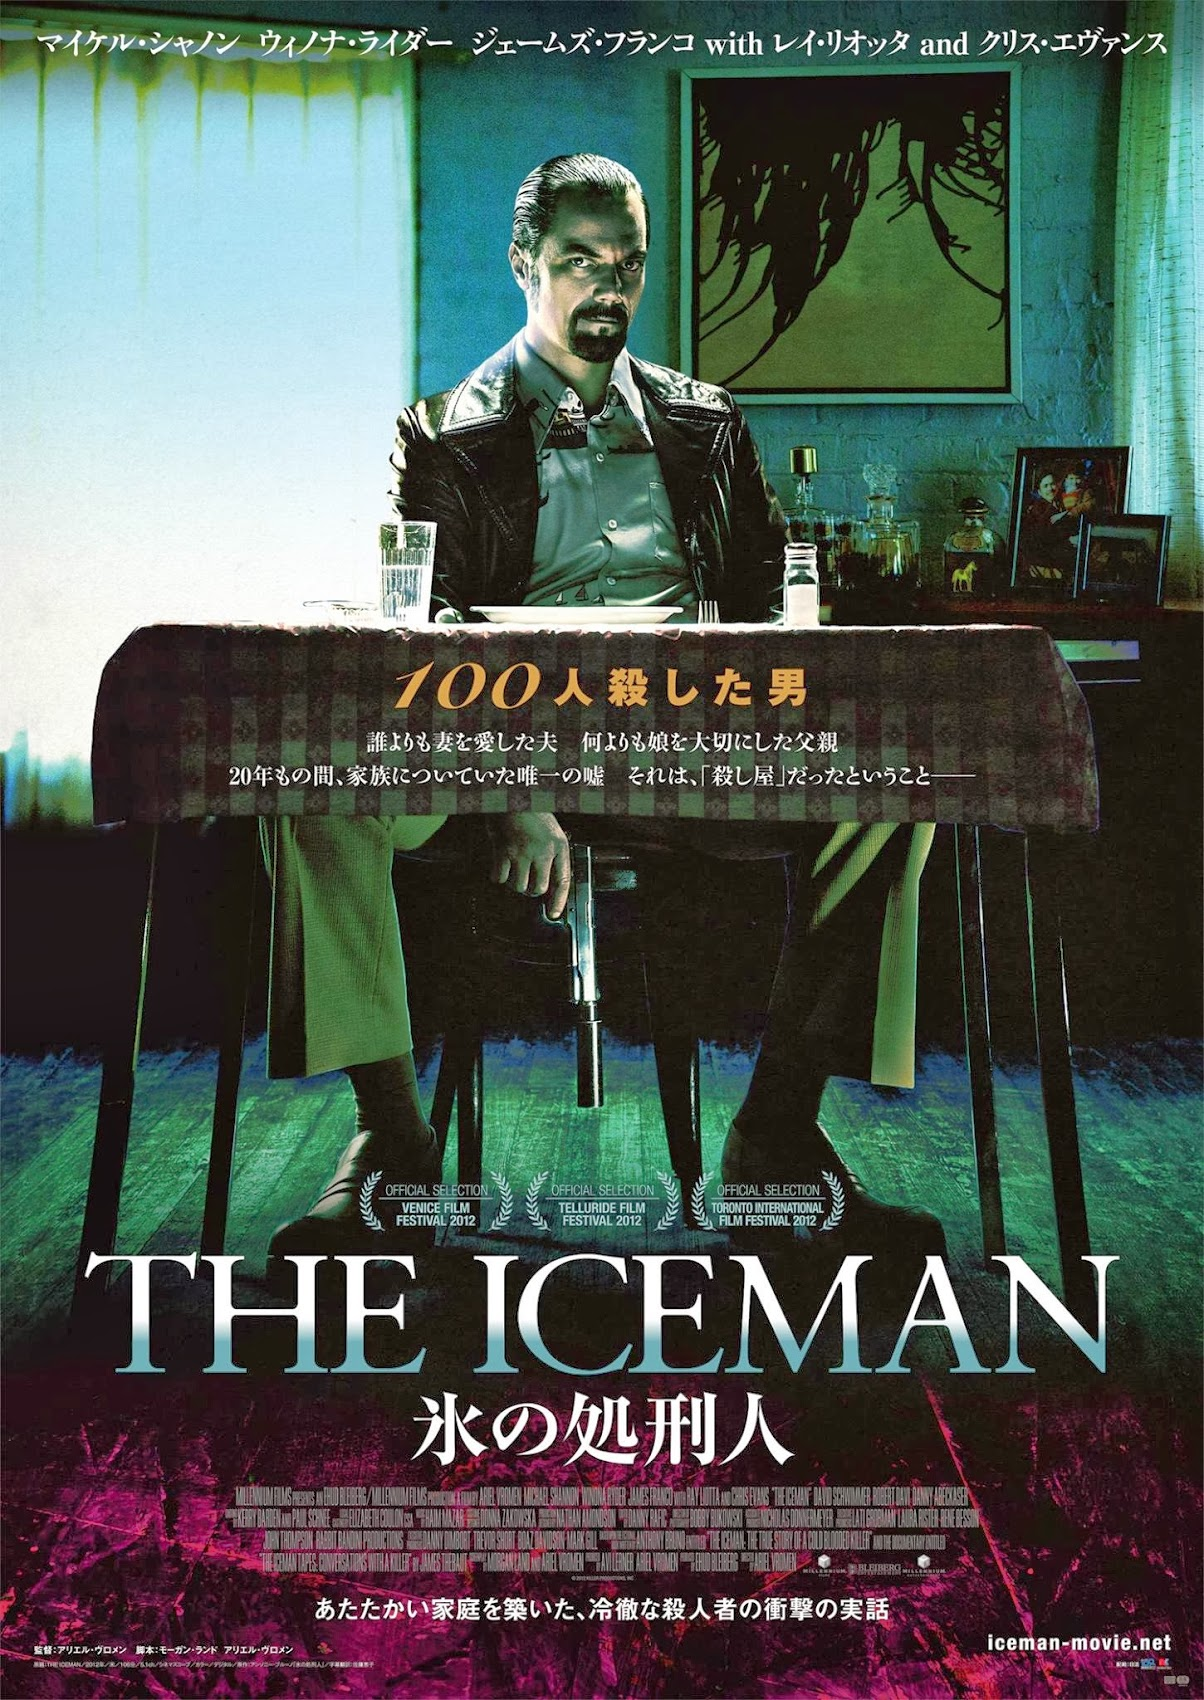 http://3.bp.blogspot.com/-kMMR6Ahm8Zo/UnWKZPx8dwI/AAAAAAAARZQ/fg3J_UI_E3M/s1700/The_Iceman_New_Poster_International_JPosters.jpg